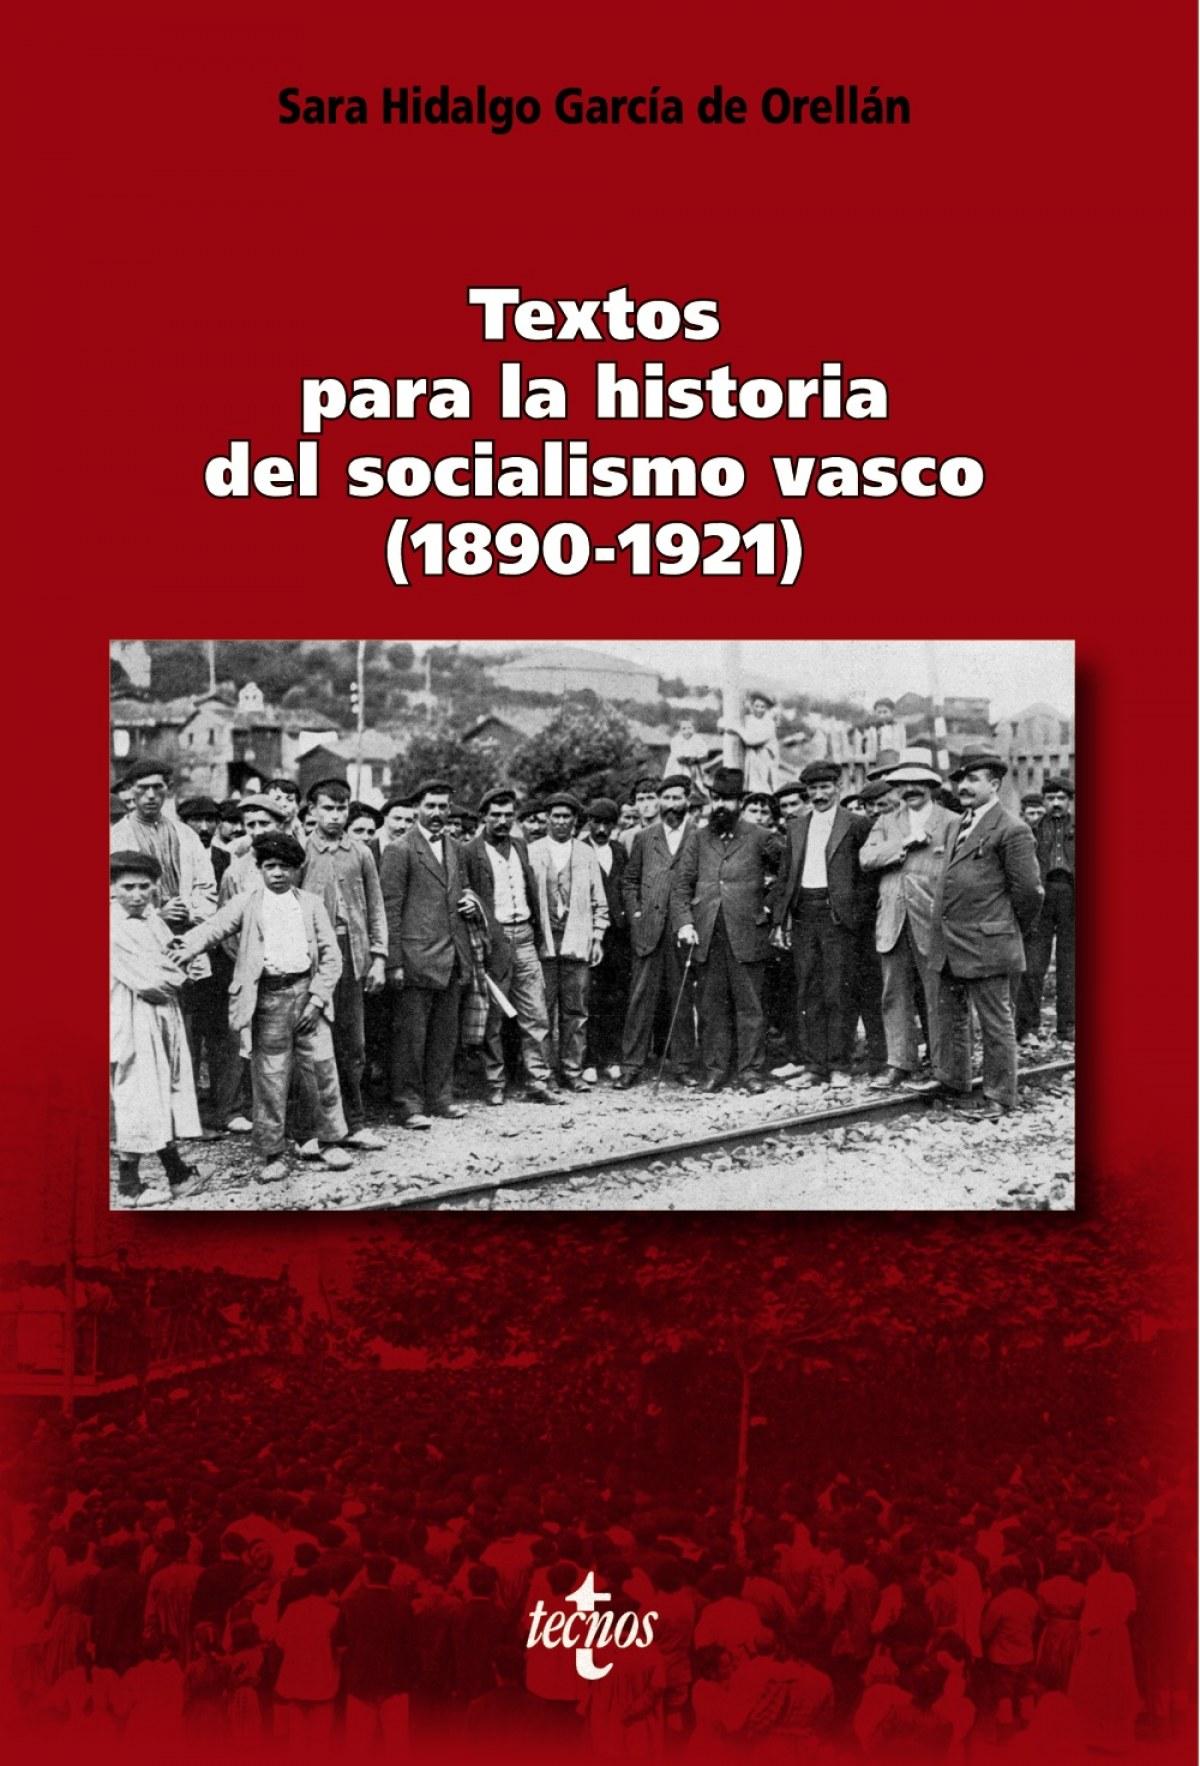 Textos para la historia del socialismo vasco (1890-1921)